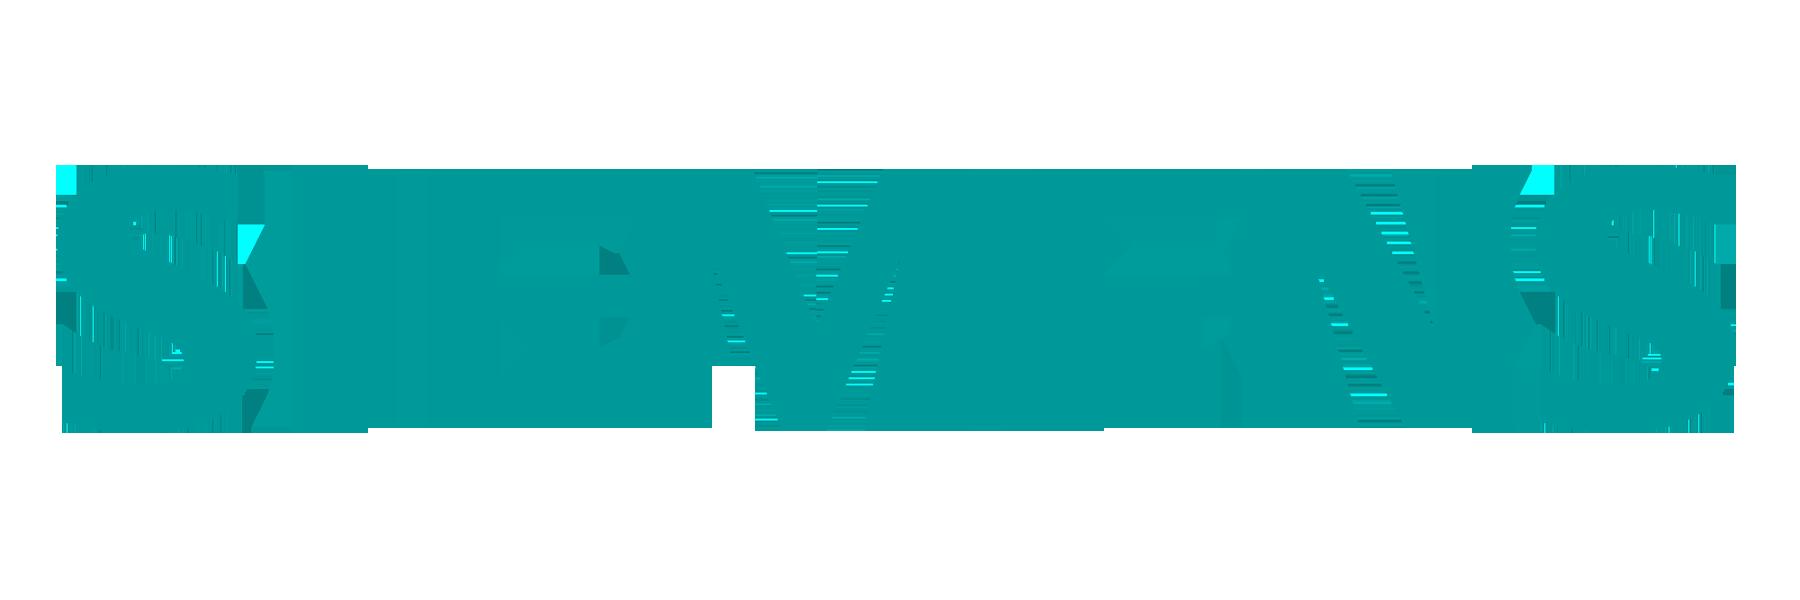 siemens logo dax